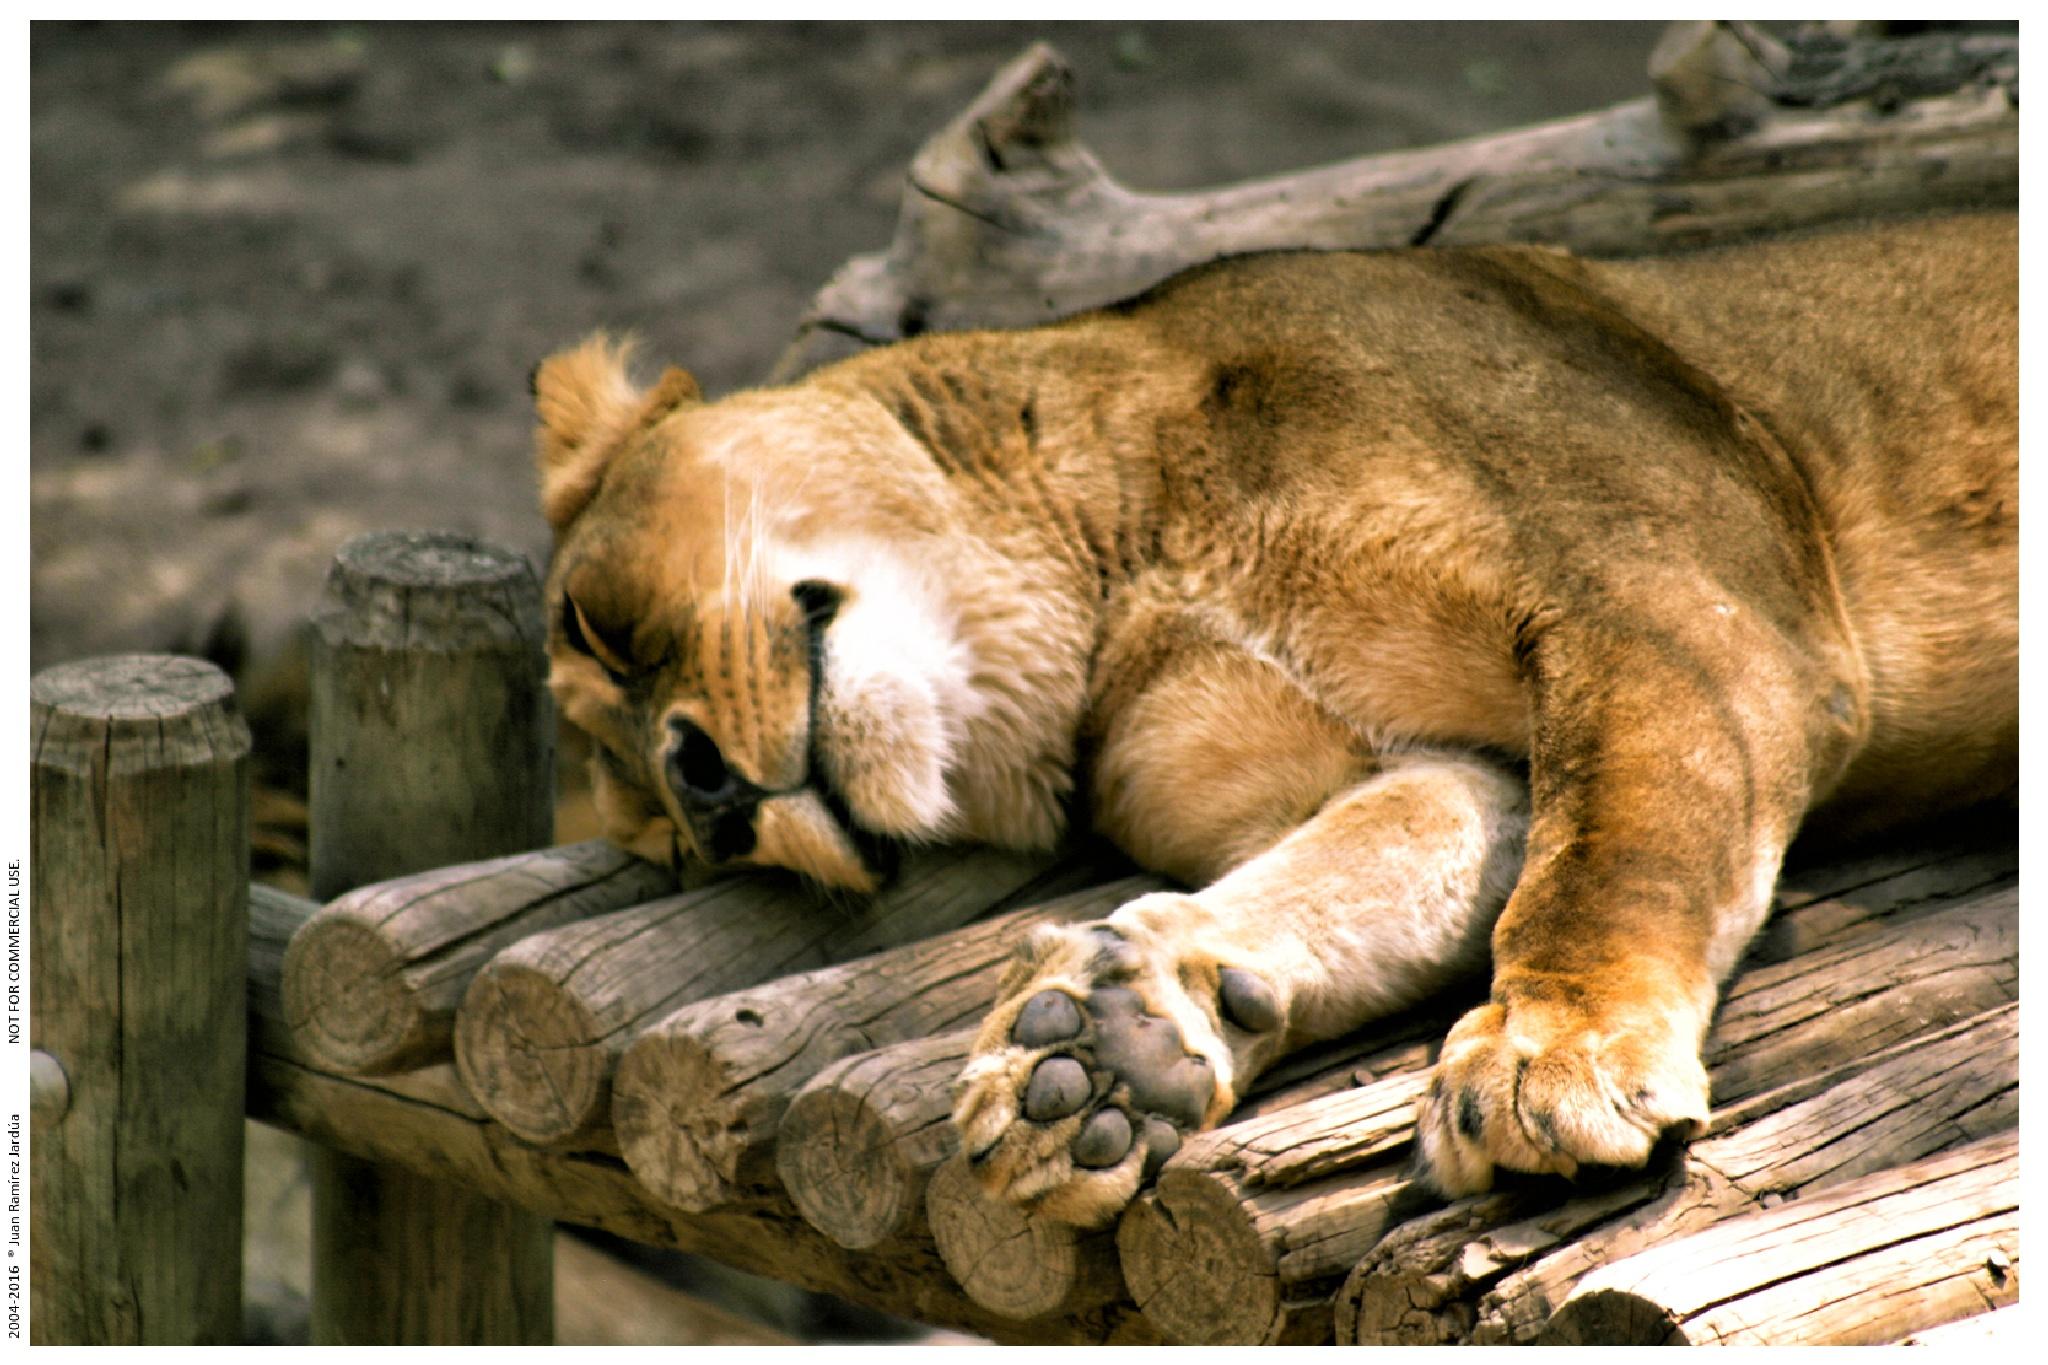 Sleep time by juanramirezj